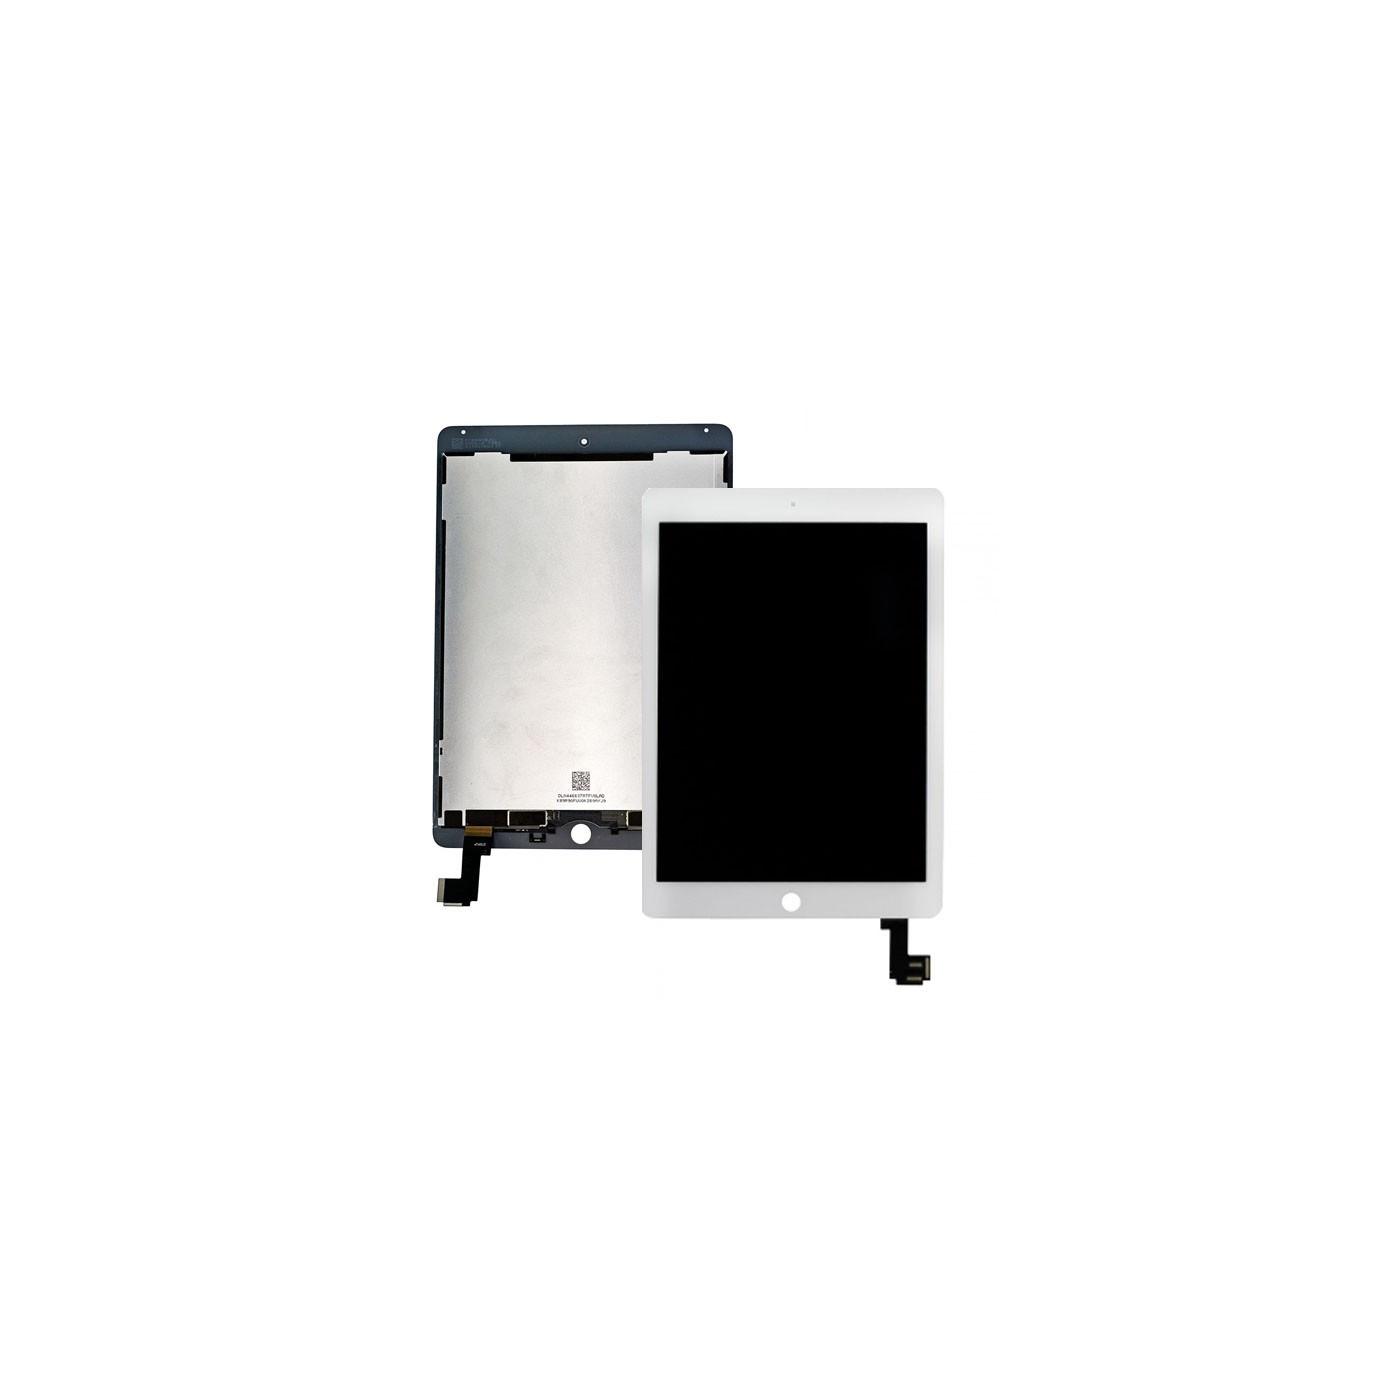 Display Lcd + Touch Screen per Apple Ipad Air 2 Bianco A1566 A1567 Ricambio